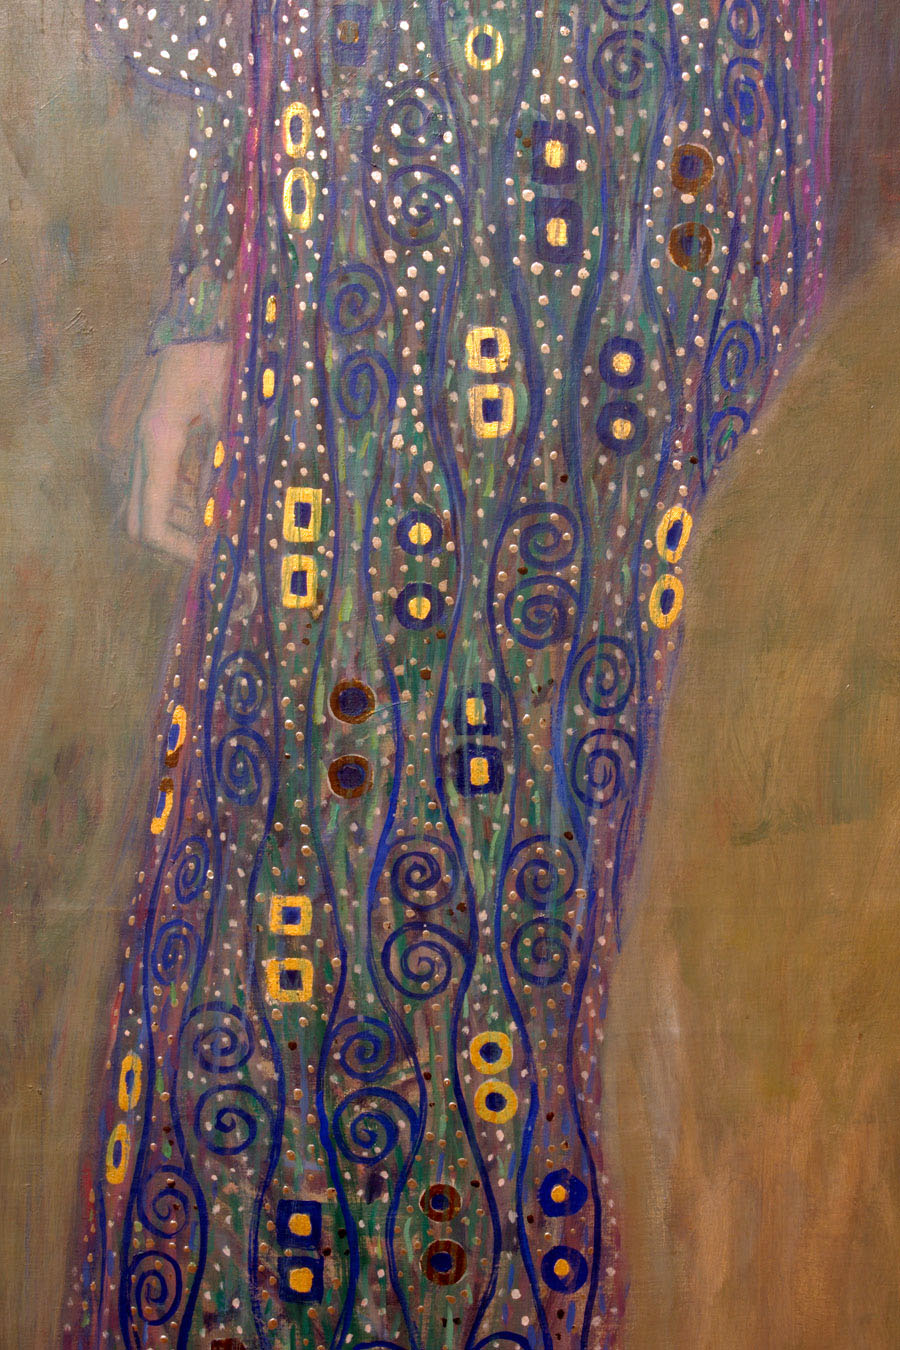 Gustave Klimt Fritza Riedler Art Blart